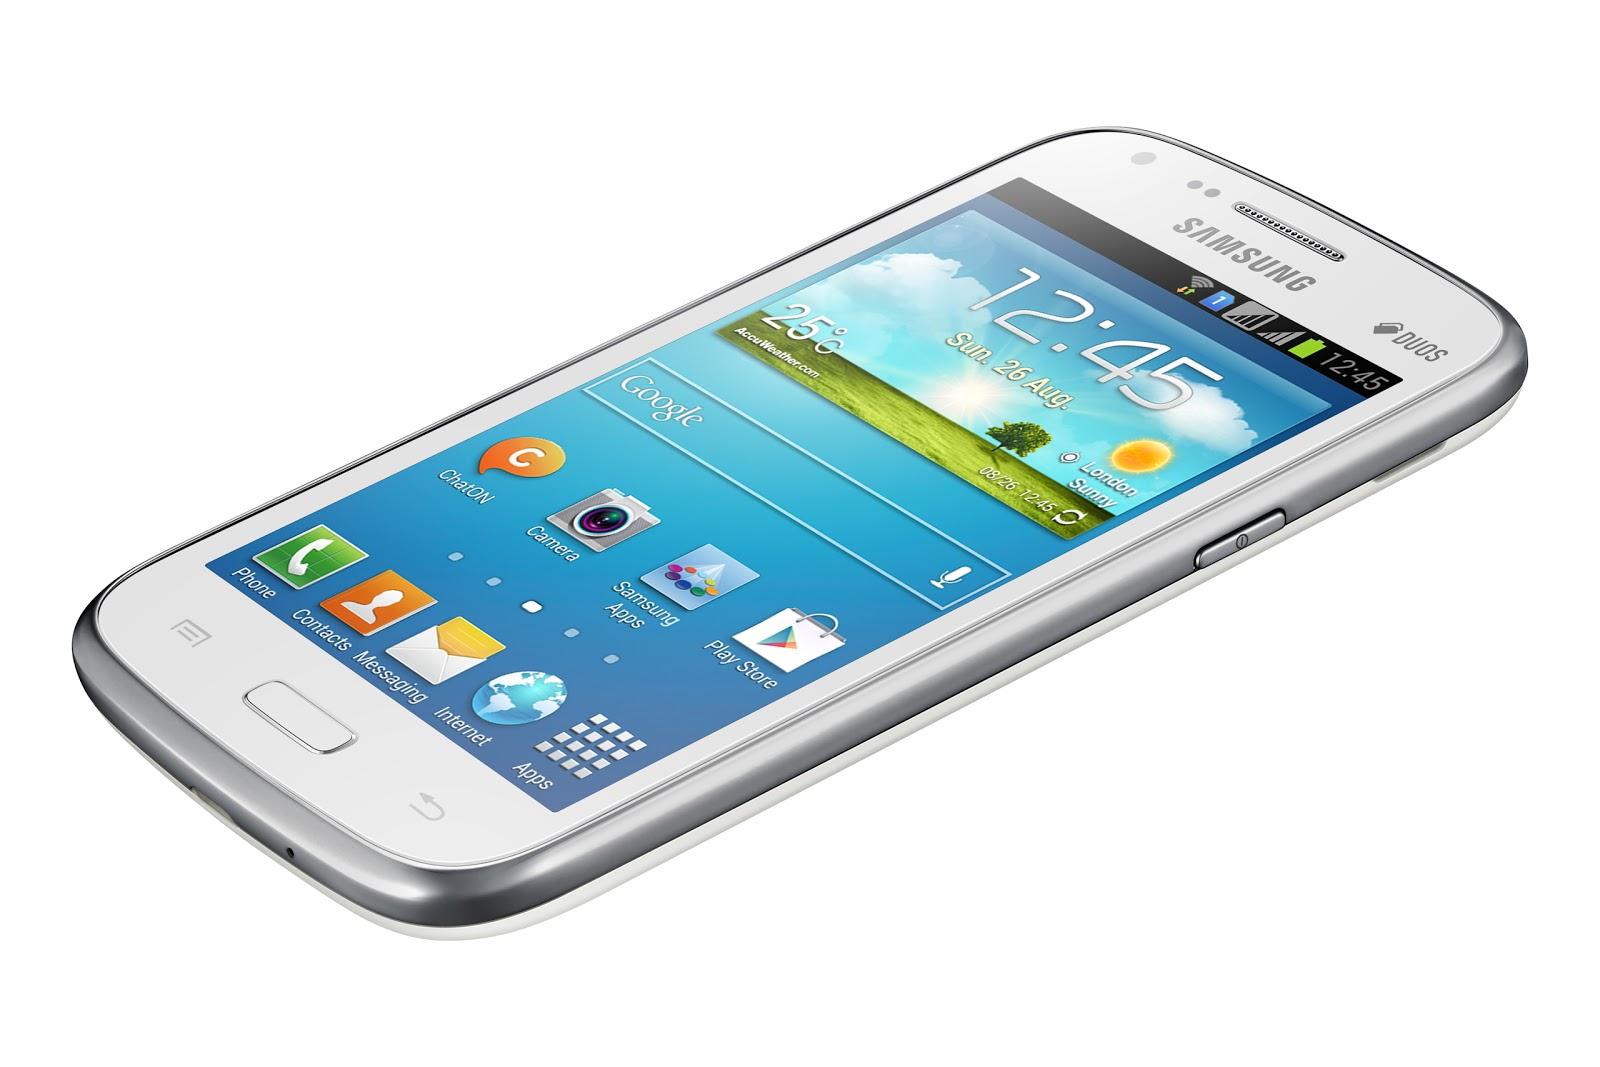 Samsung Dual Sim 2013 Harga samsung galaxy core